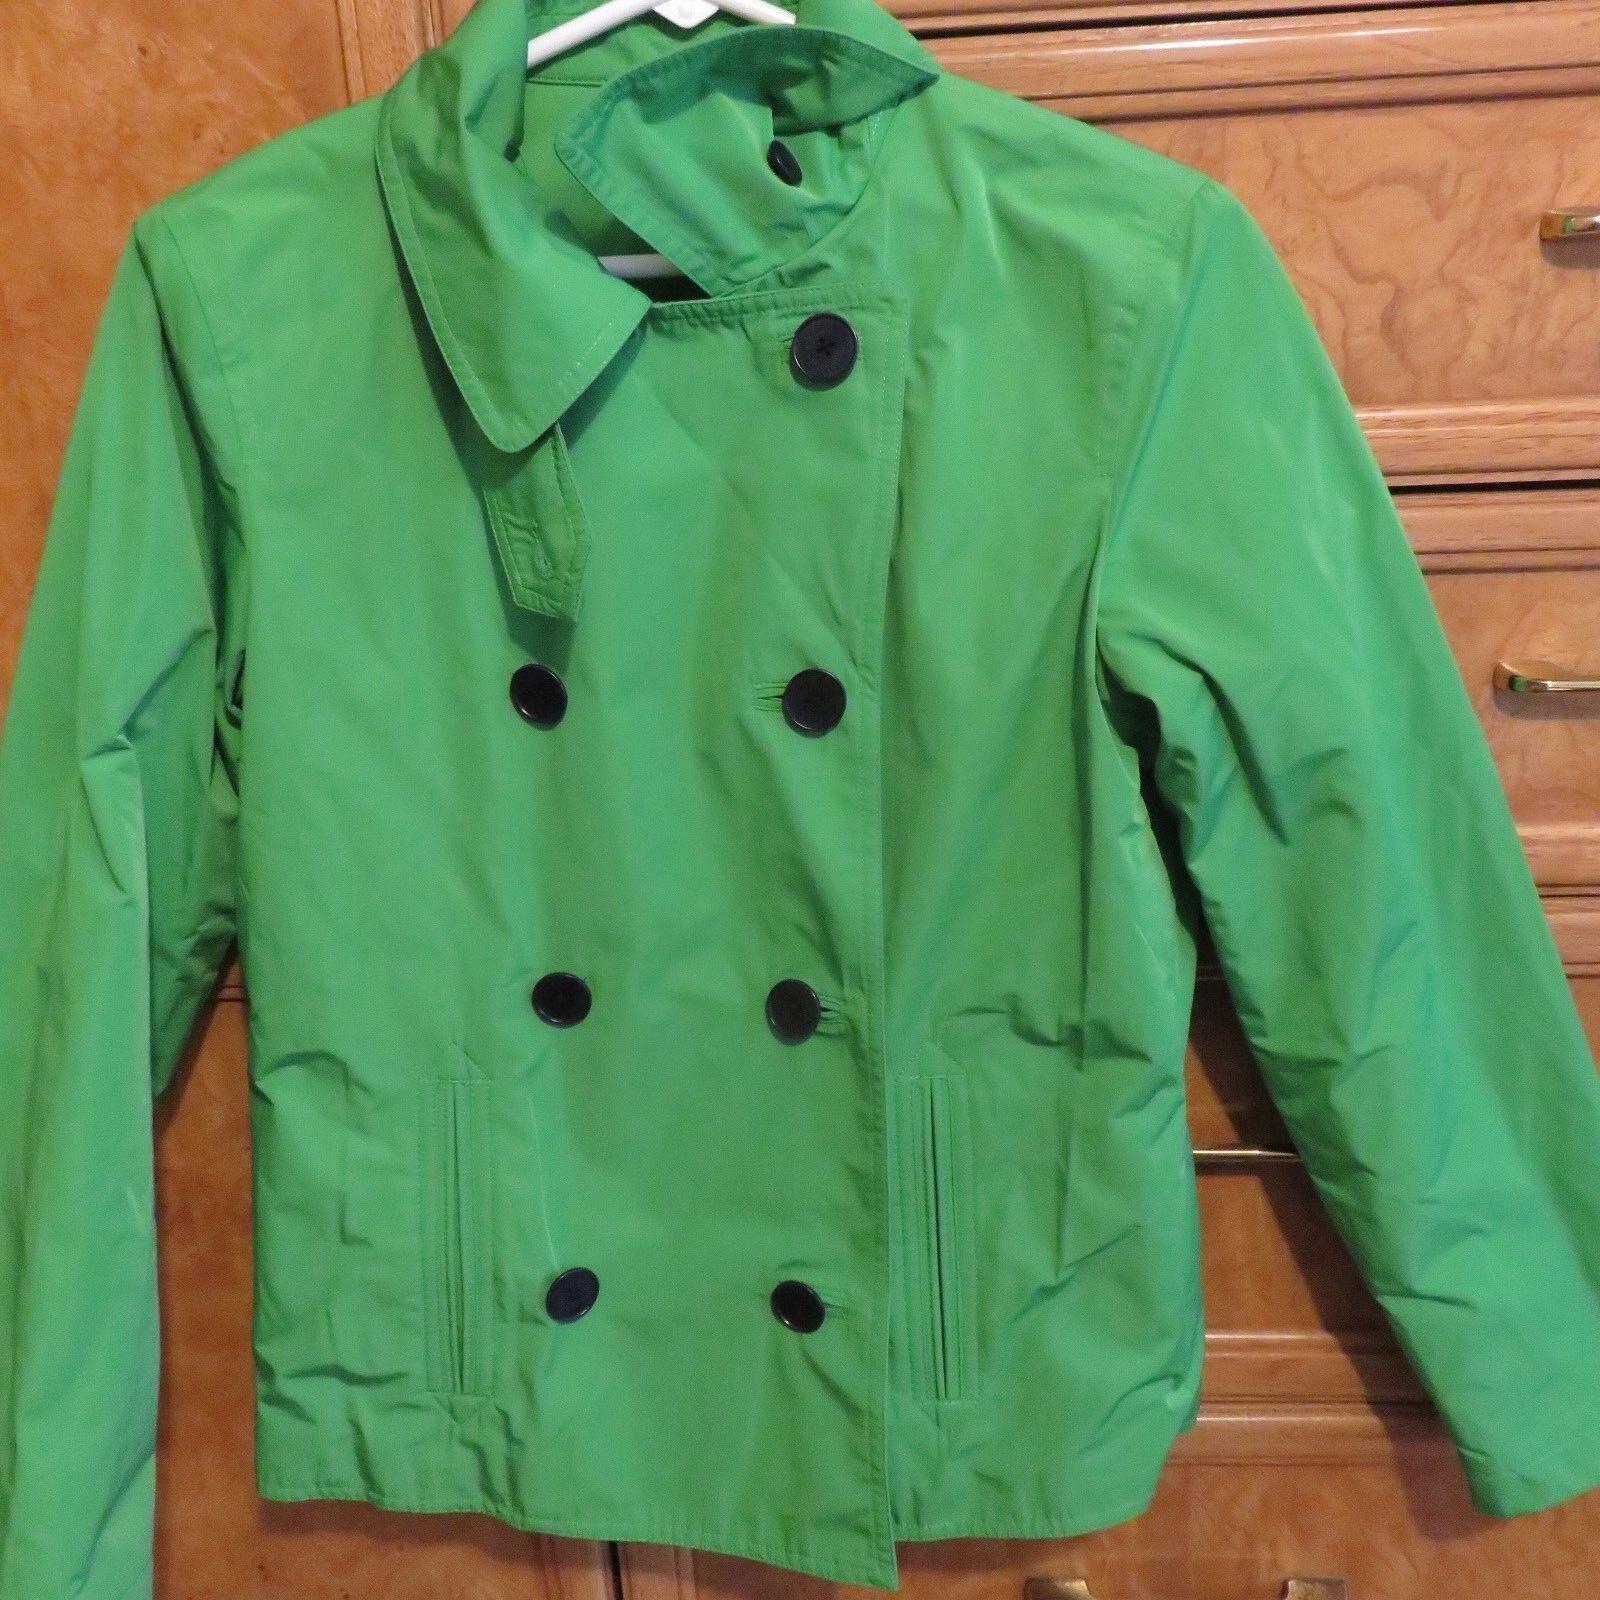 Kvinnors L -RL Ralph Lauren dubbelbröstad grön regnrock sz petite 4P NWT  198